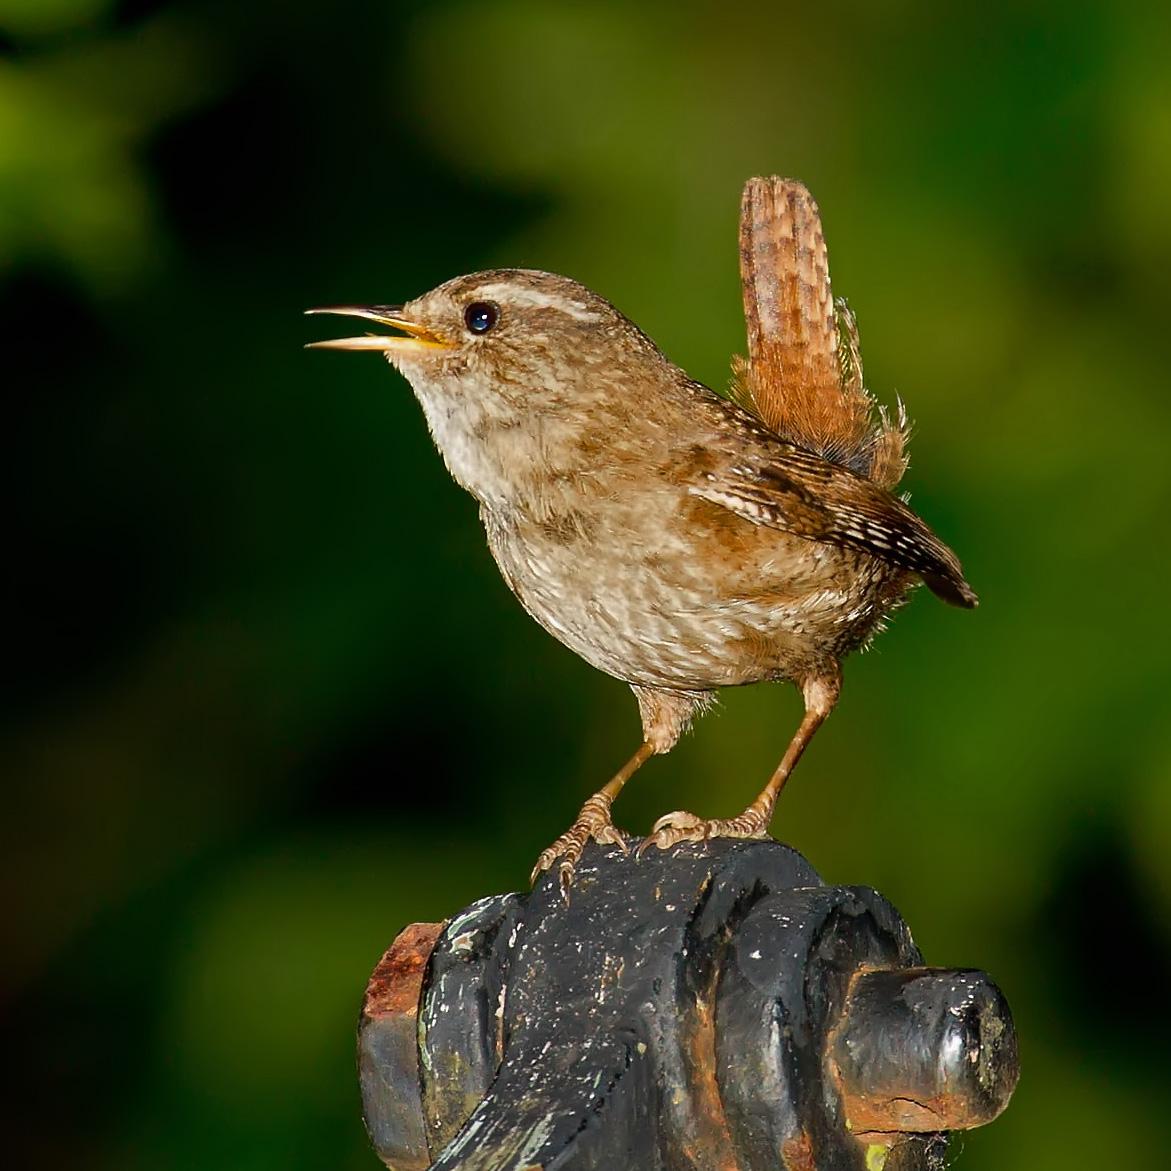 Çit kuşu, Foto: Andreas Trepte